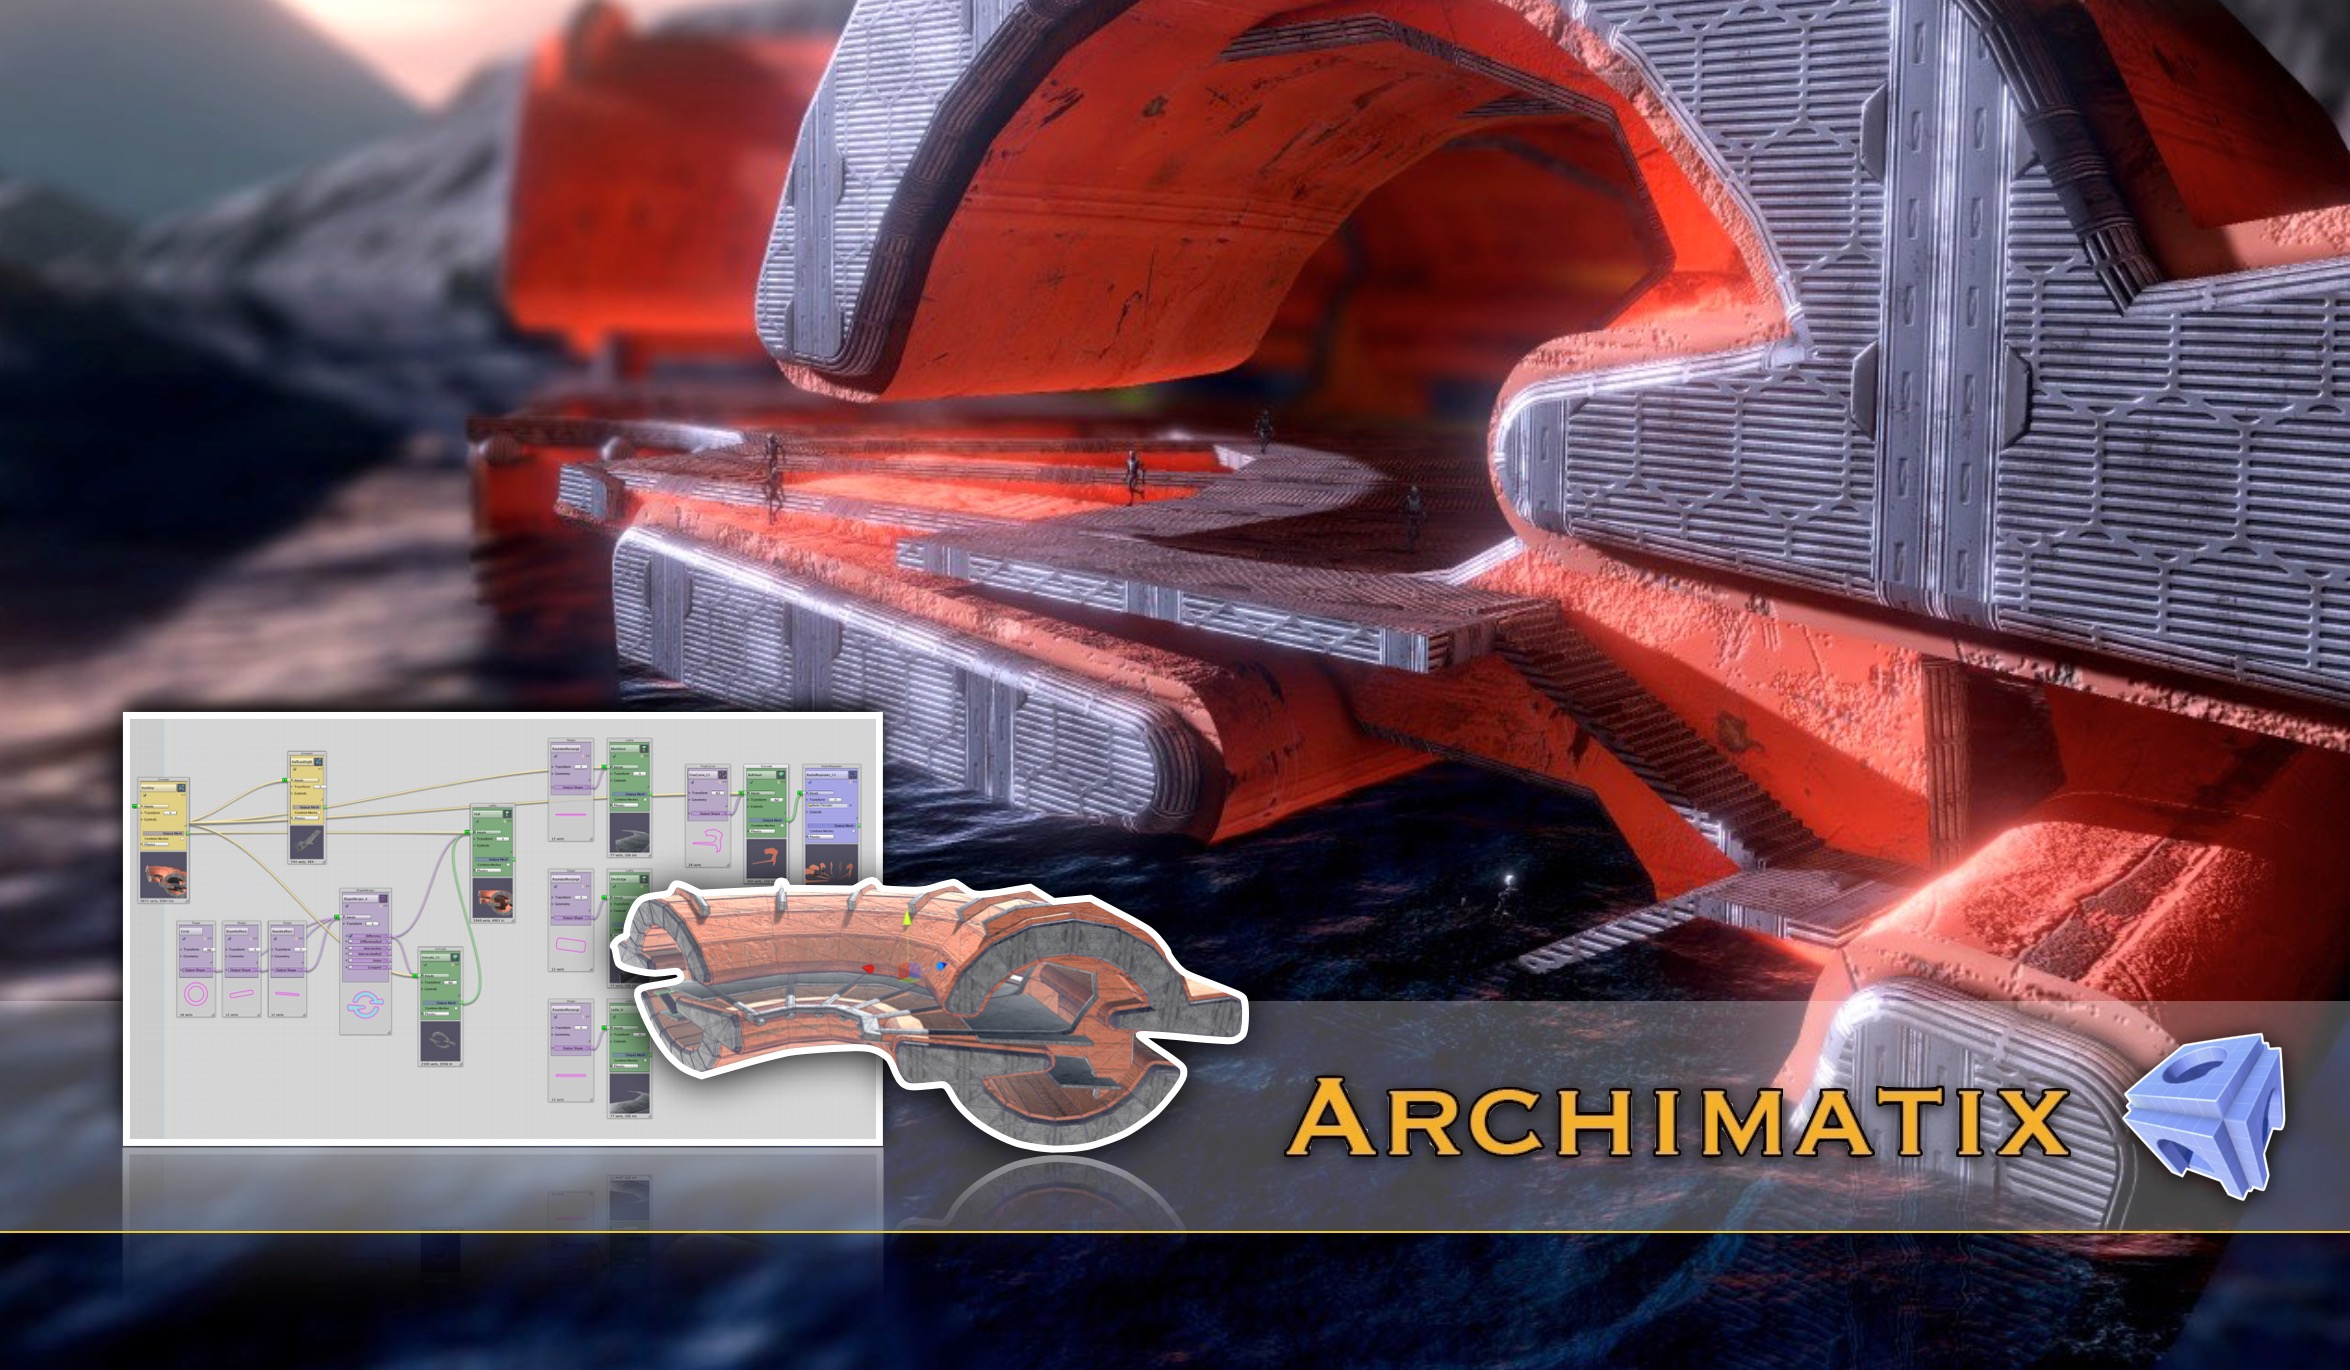 Archimatix 2017-03-31_02-52-59_PM.jpg